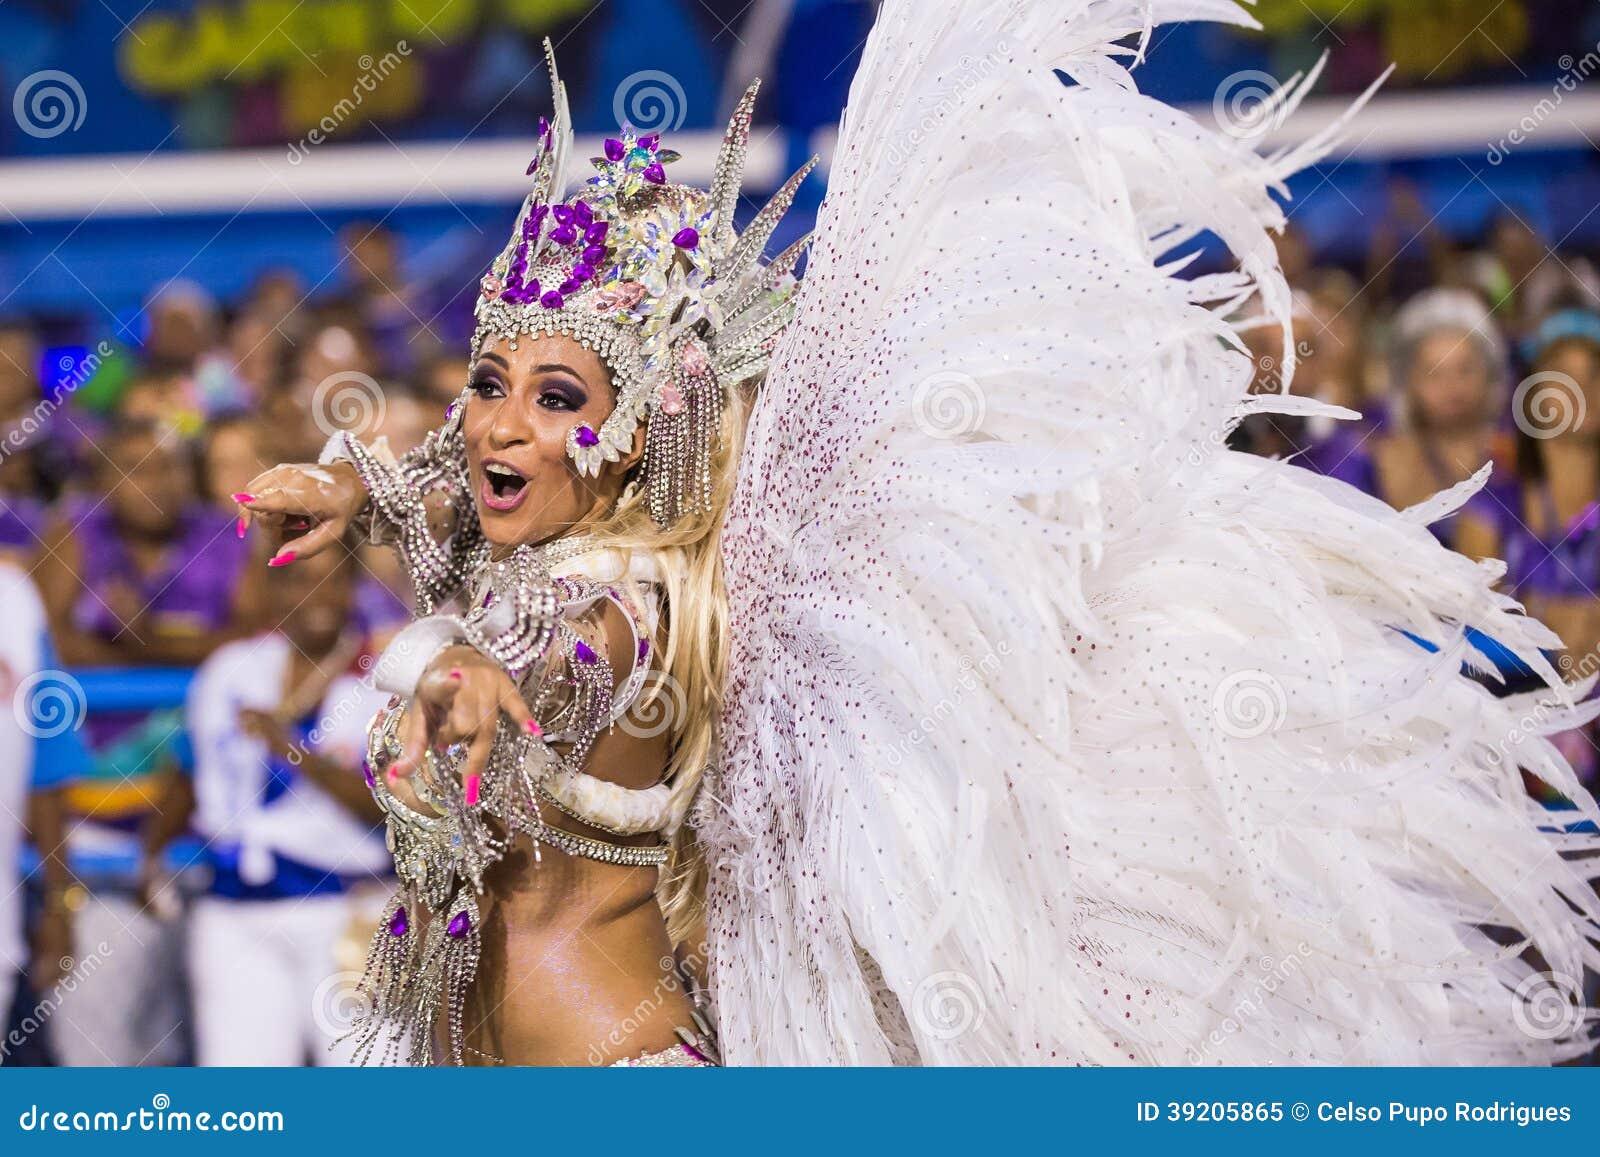 Canrnival 2014